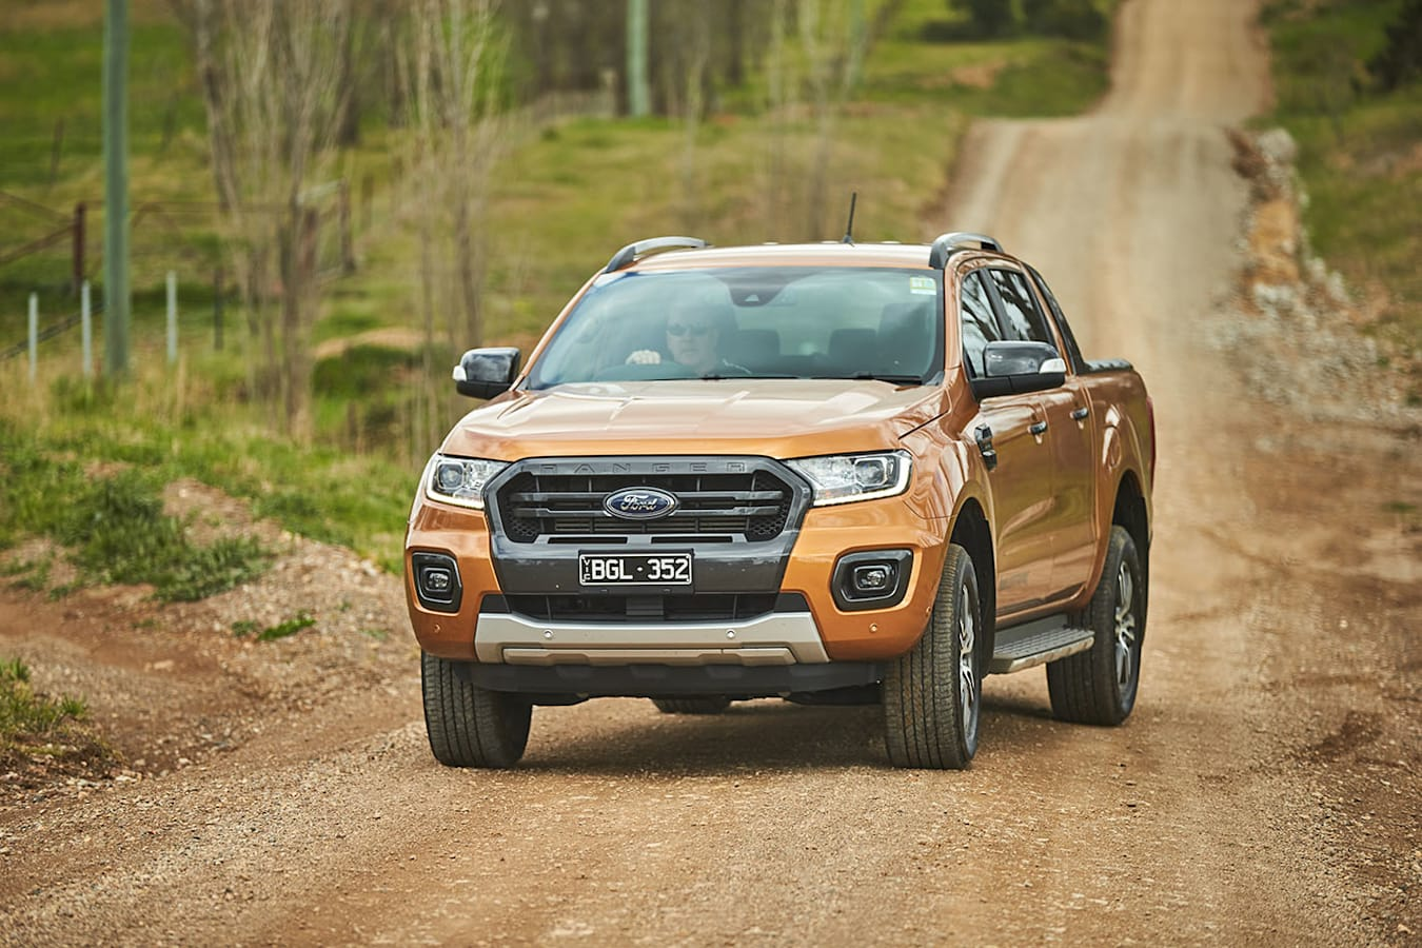 Ford Ranger Wildtrak driving